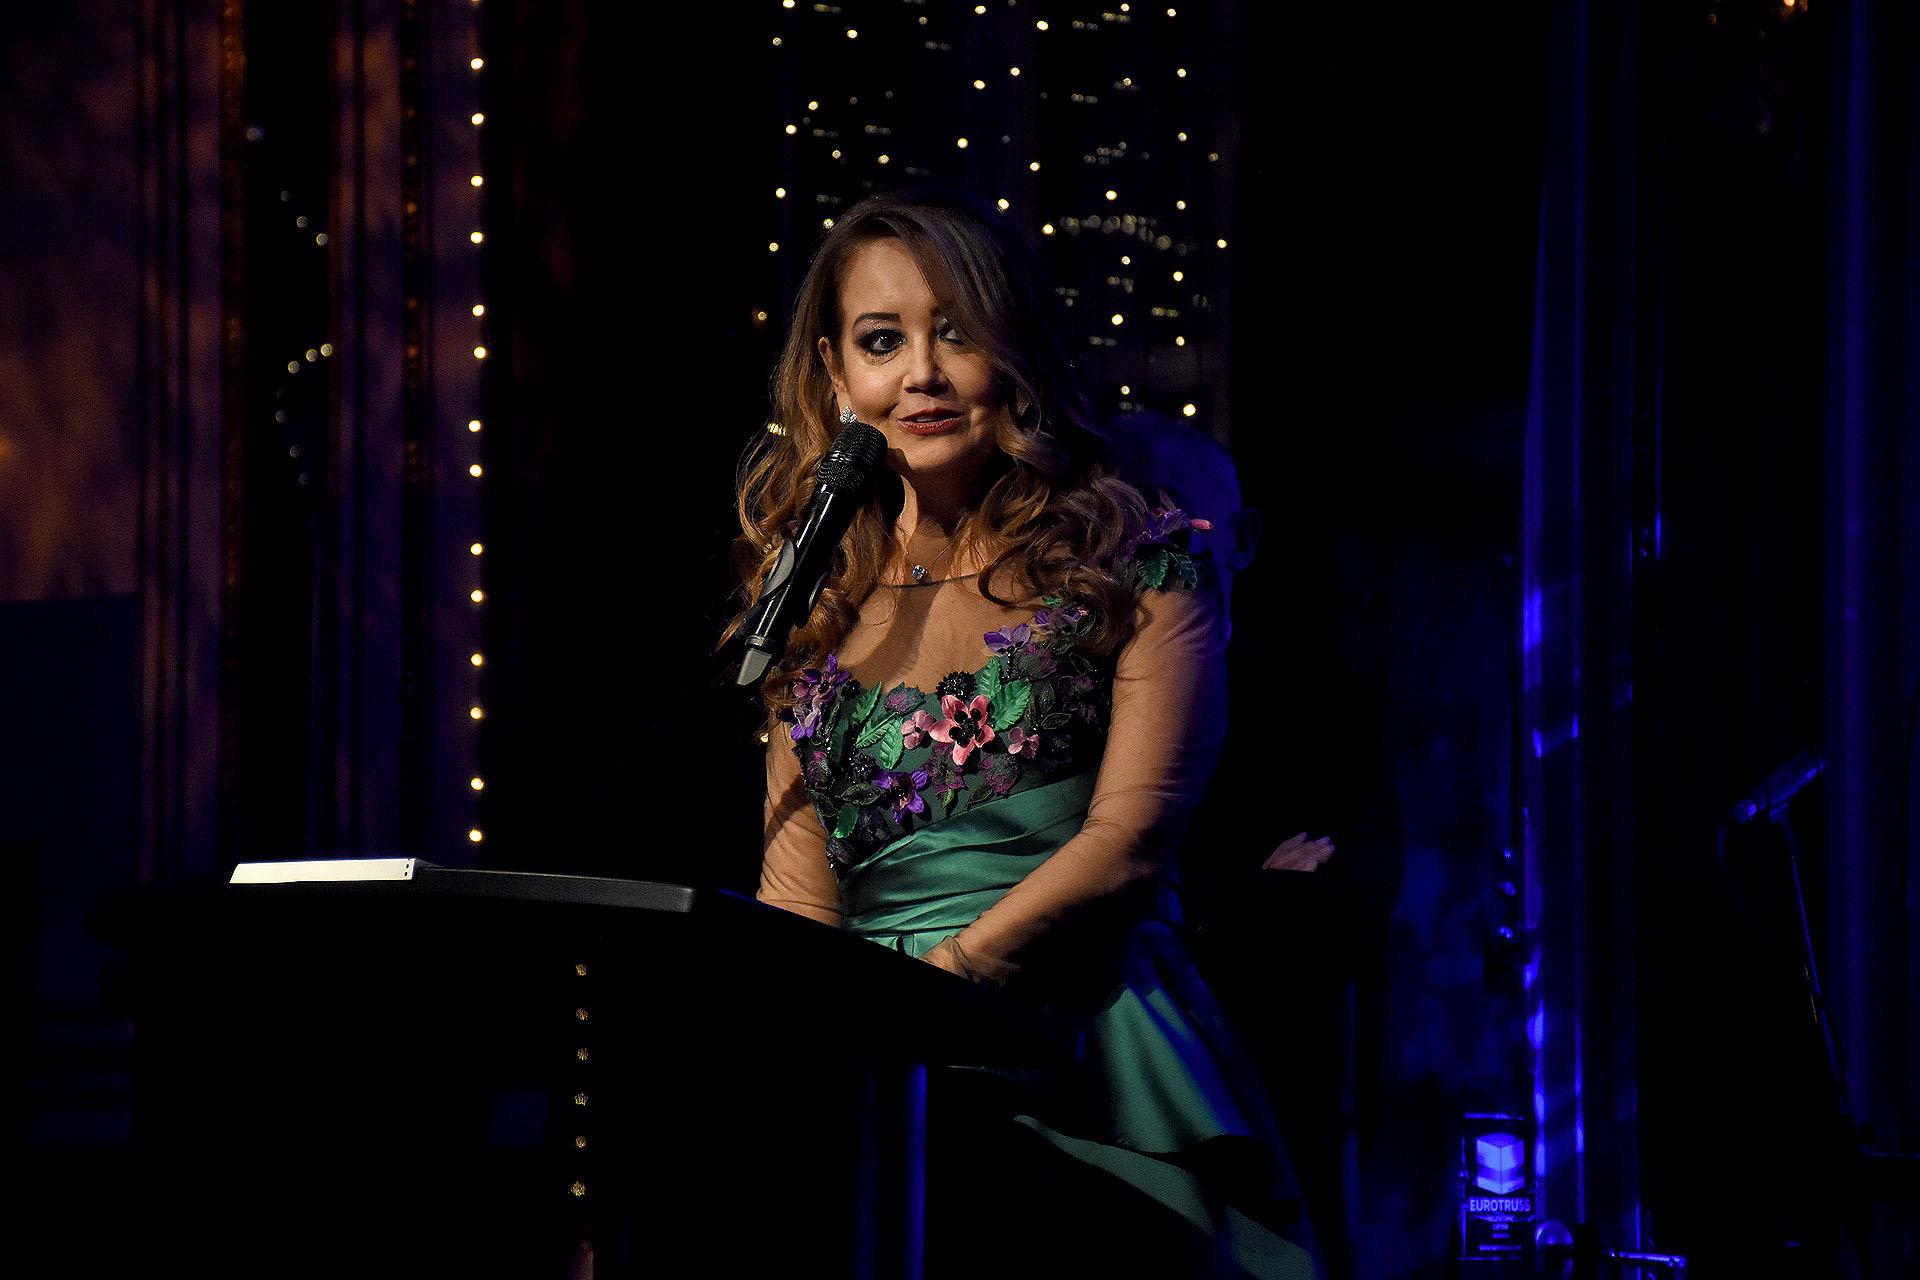 El discurso de Mónica Parisier, presidente de Make-A-Wish Argentina, durante la tradicional gala benéfica